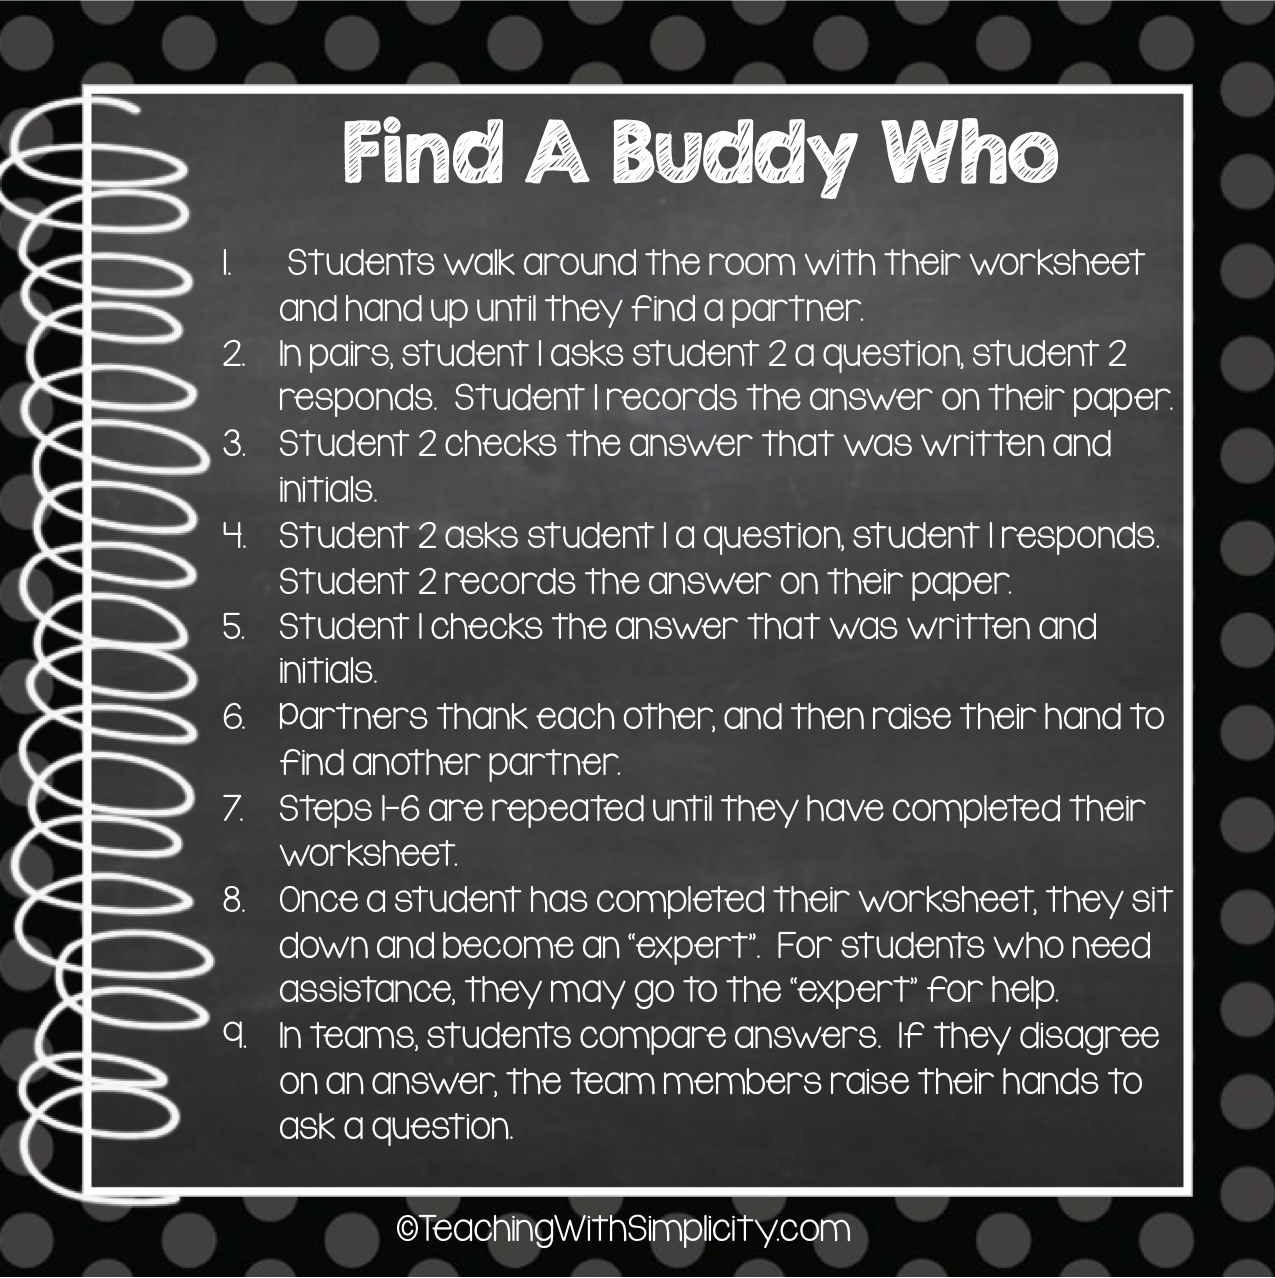 Find A Buddy Who